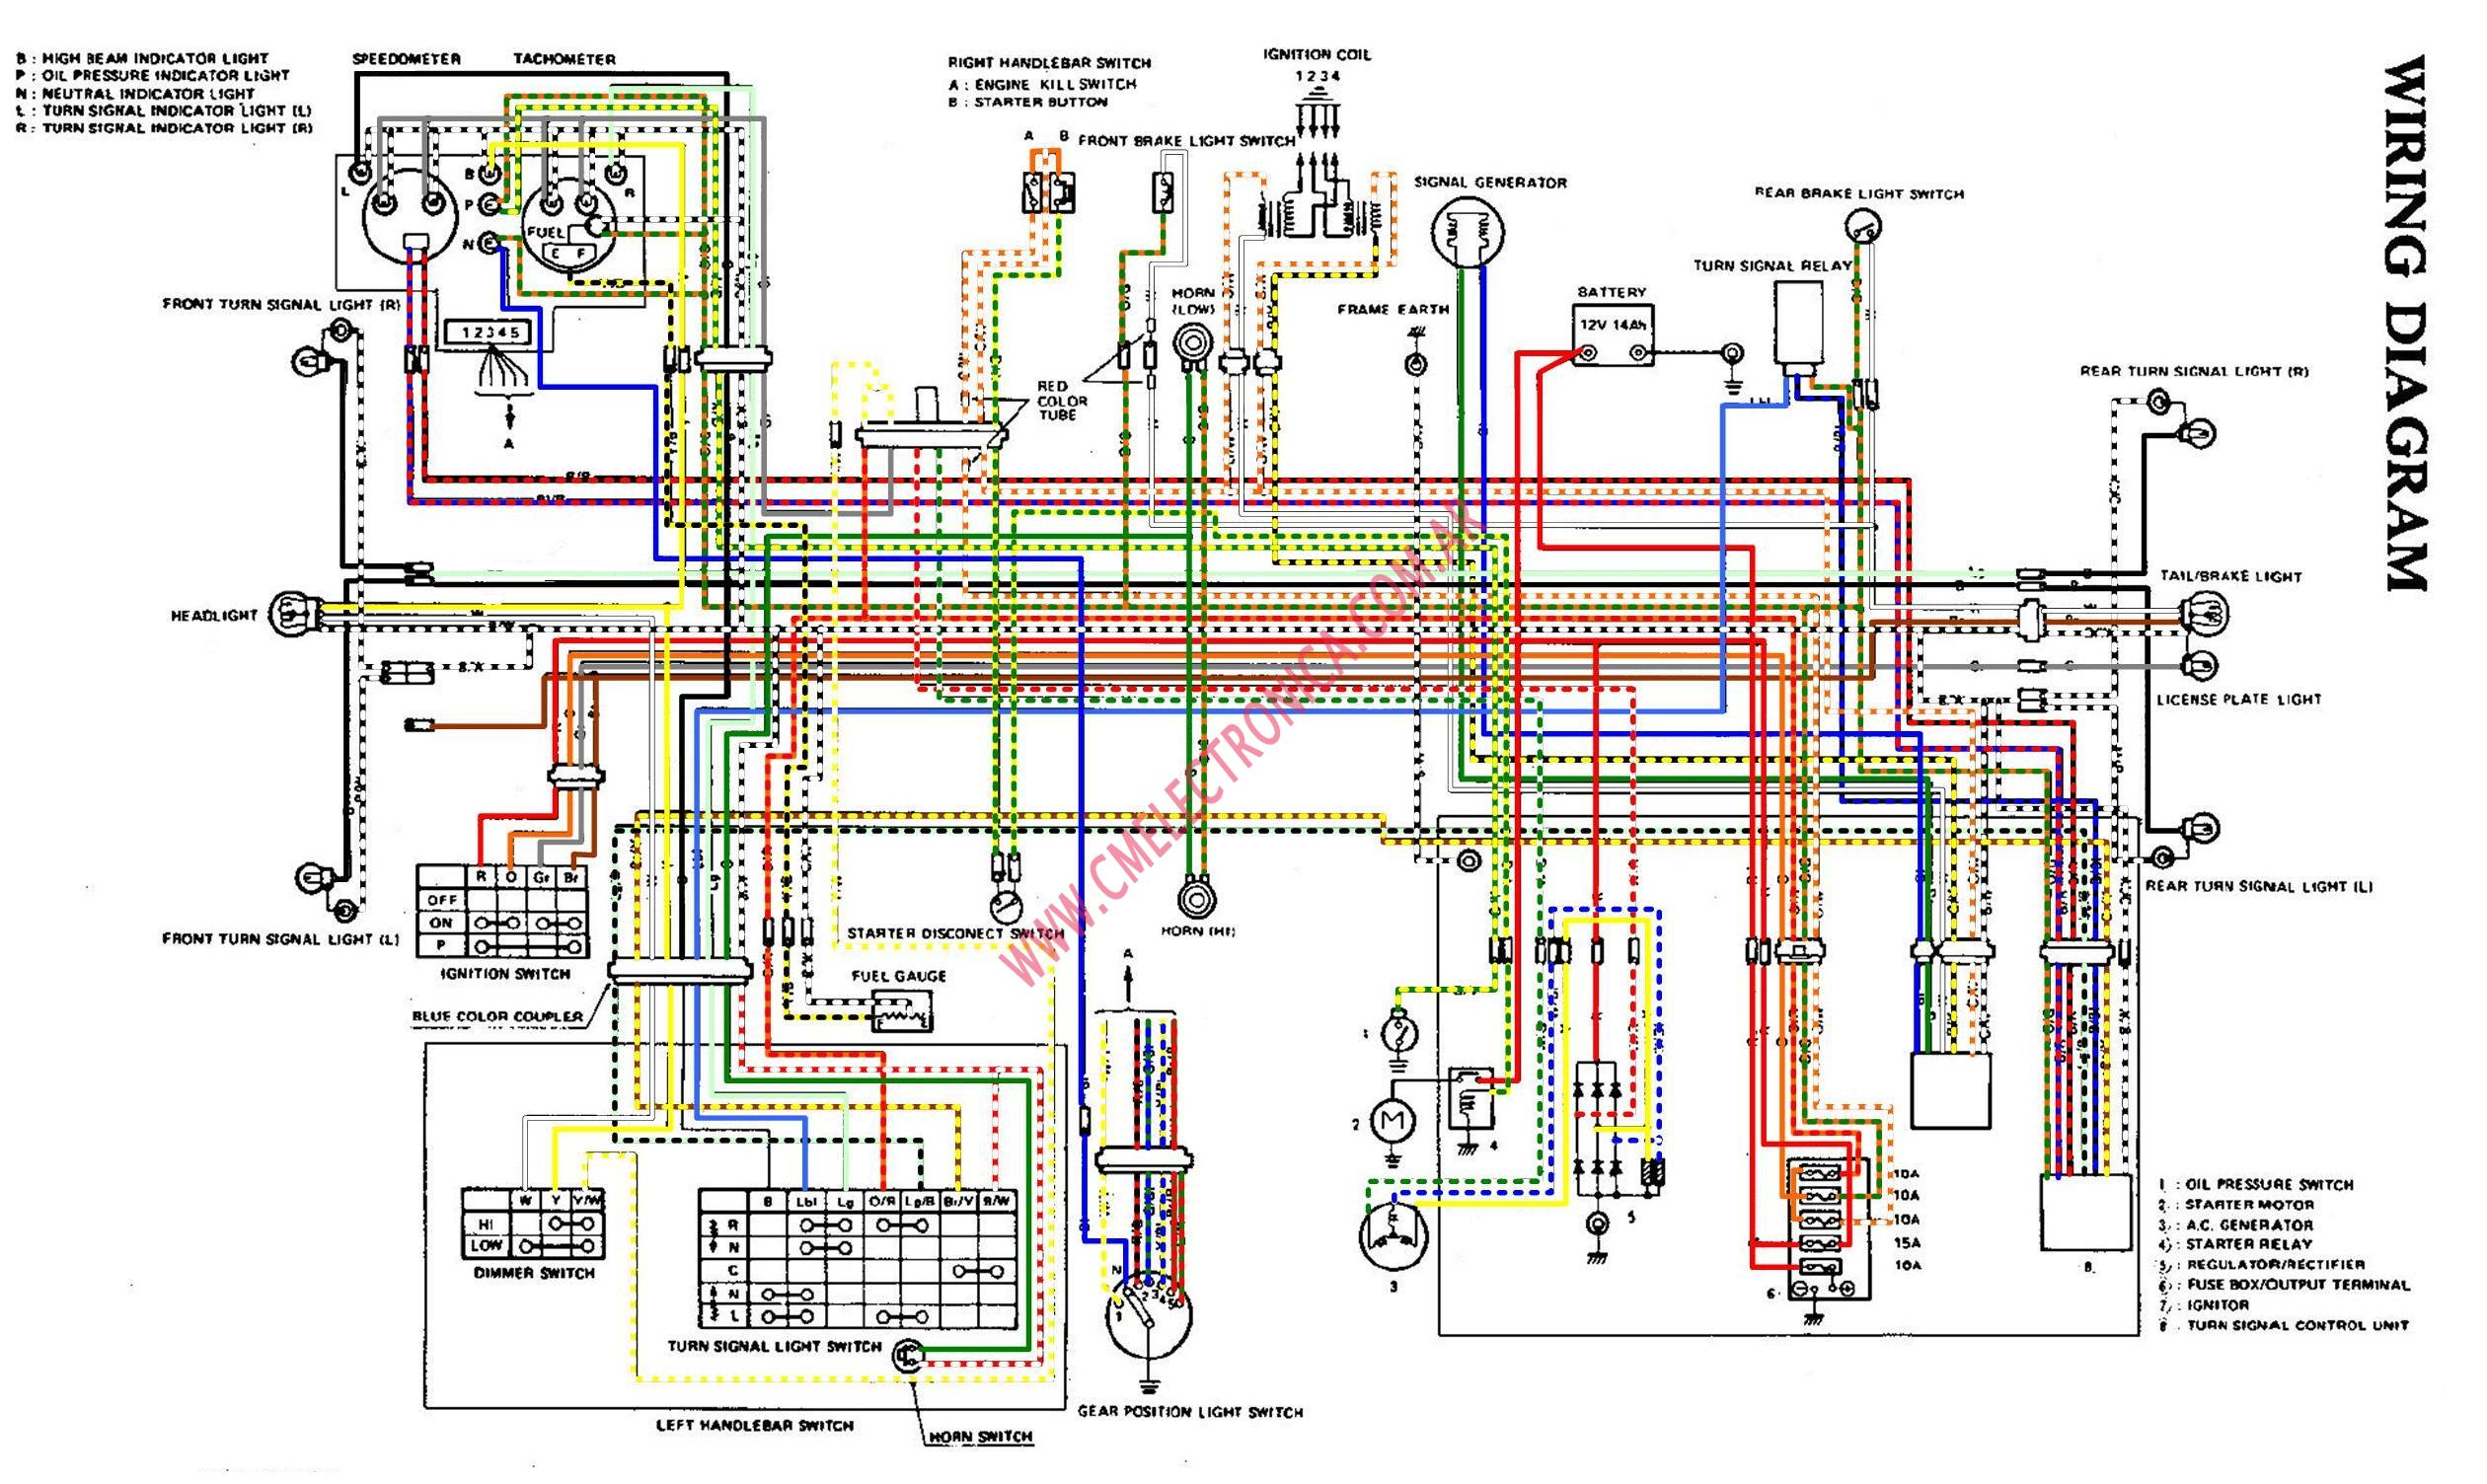 DIAGRAM] 2002 Vz800 Wiring Diagram FULL Version HD Quality Wiring Diagram -  ENDIAGRAM.FESTIVALACQUEDOTTE.ITDiagram Database